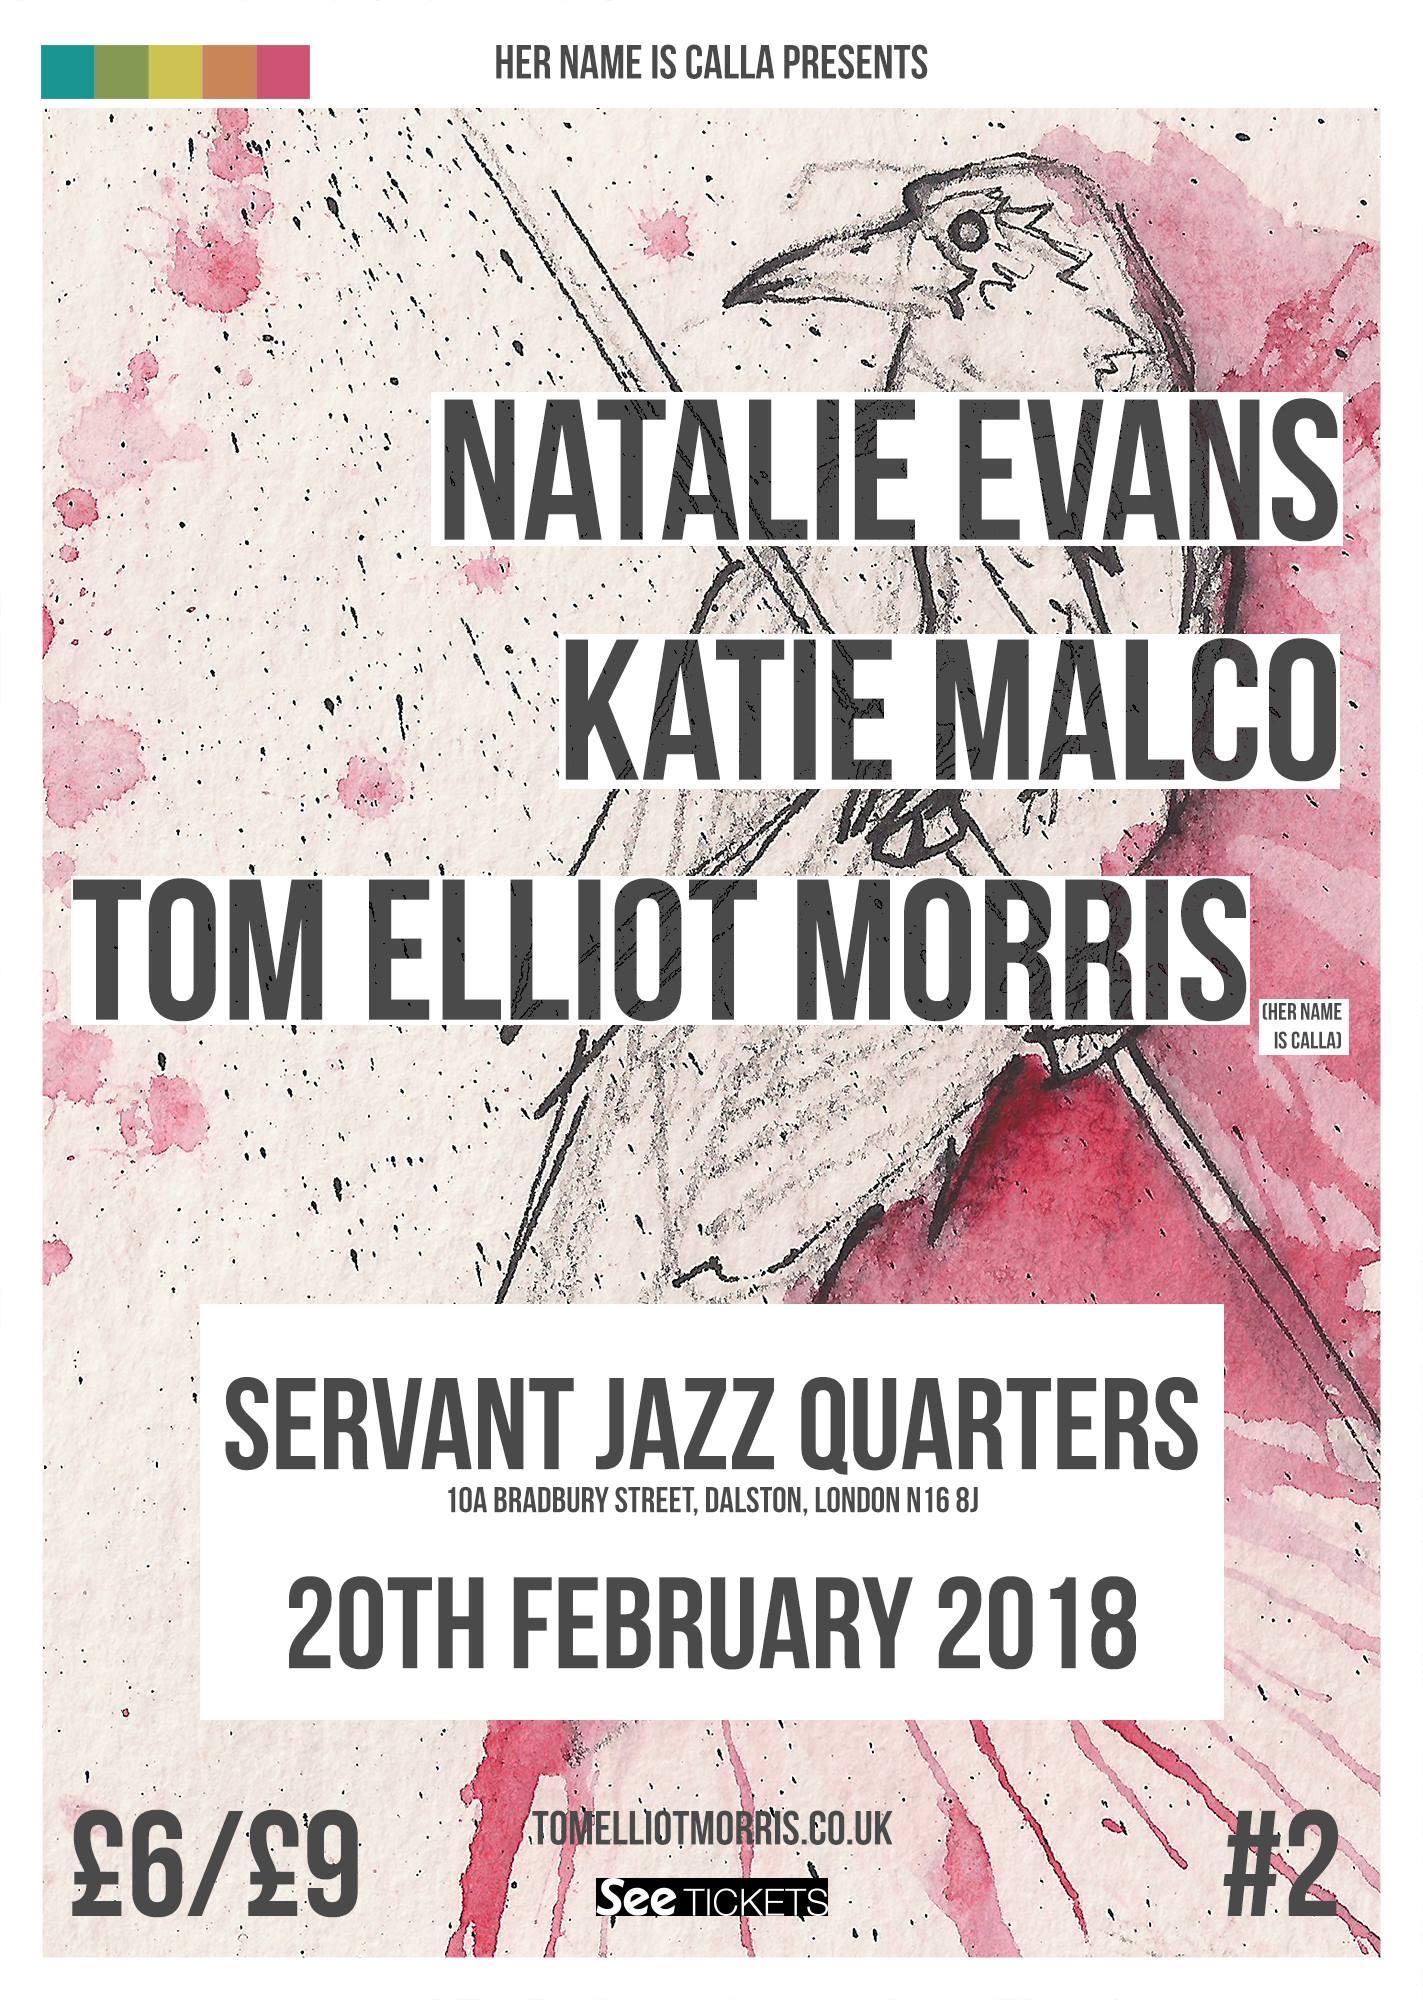 Natalie Evans, Katie Malco, Tom Elliot Morris